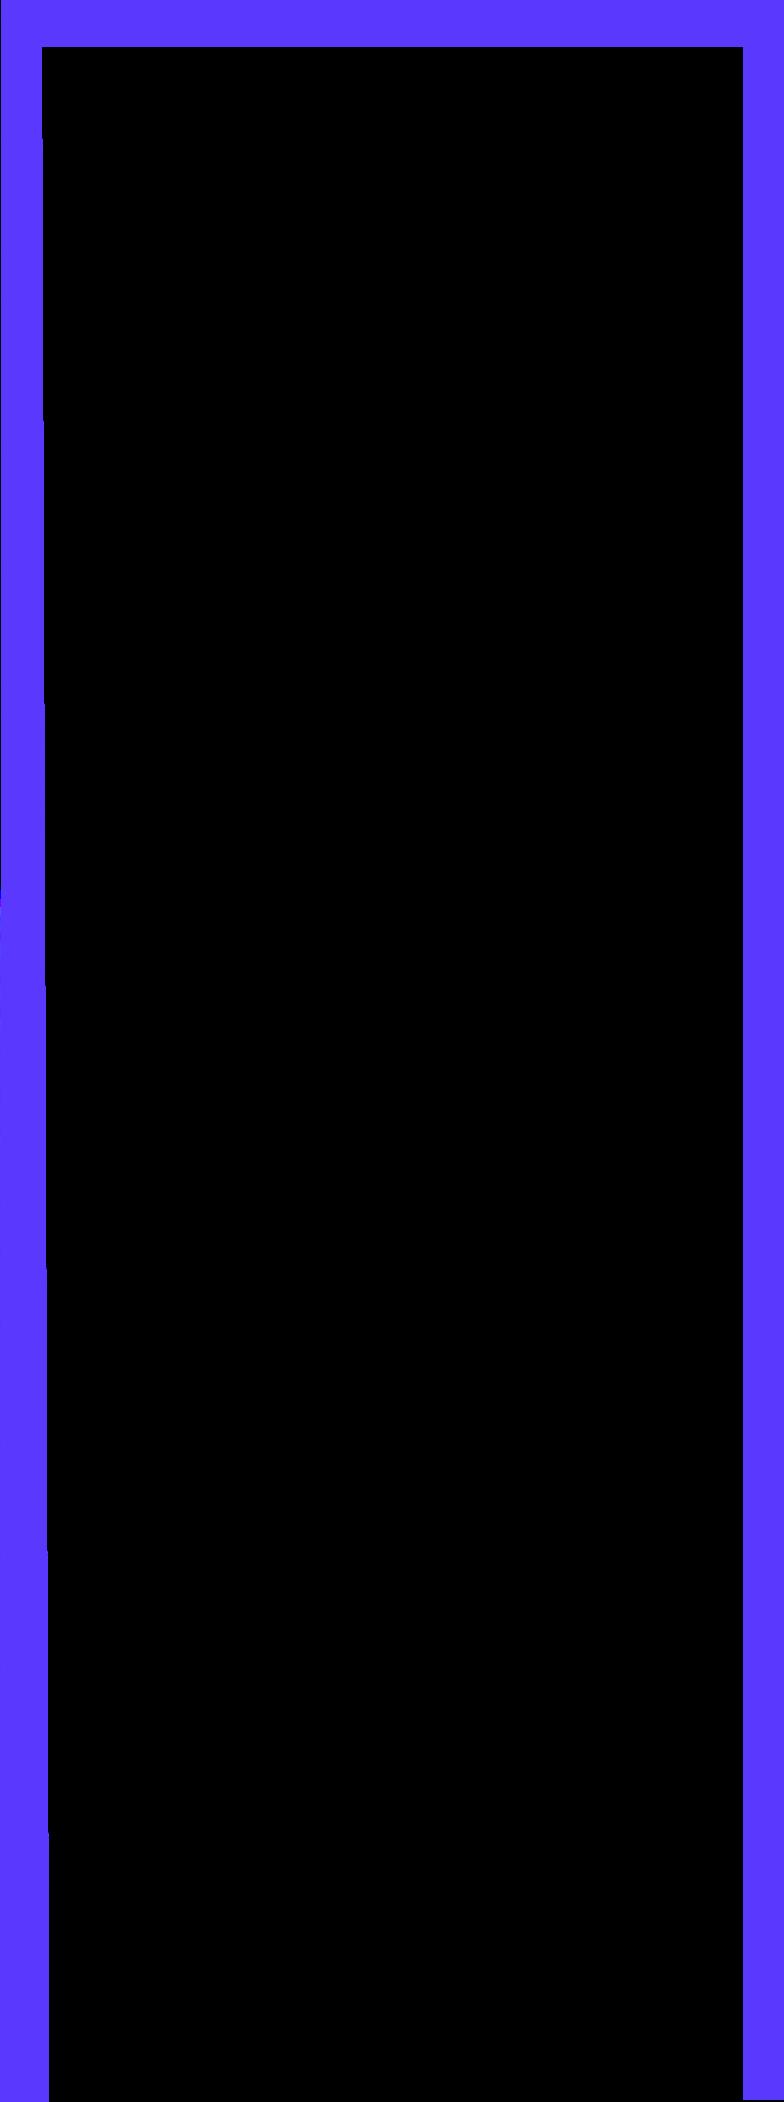 doorway Clipart illustration in PNG, SVG